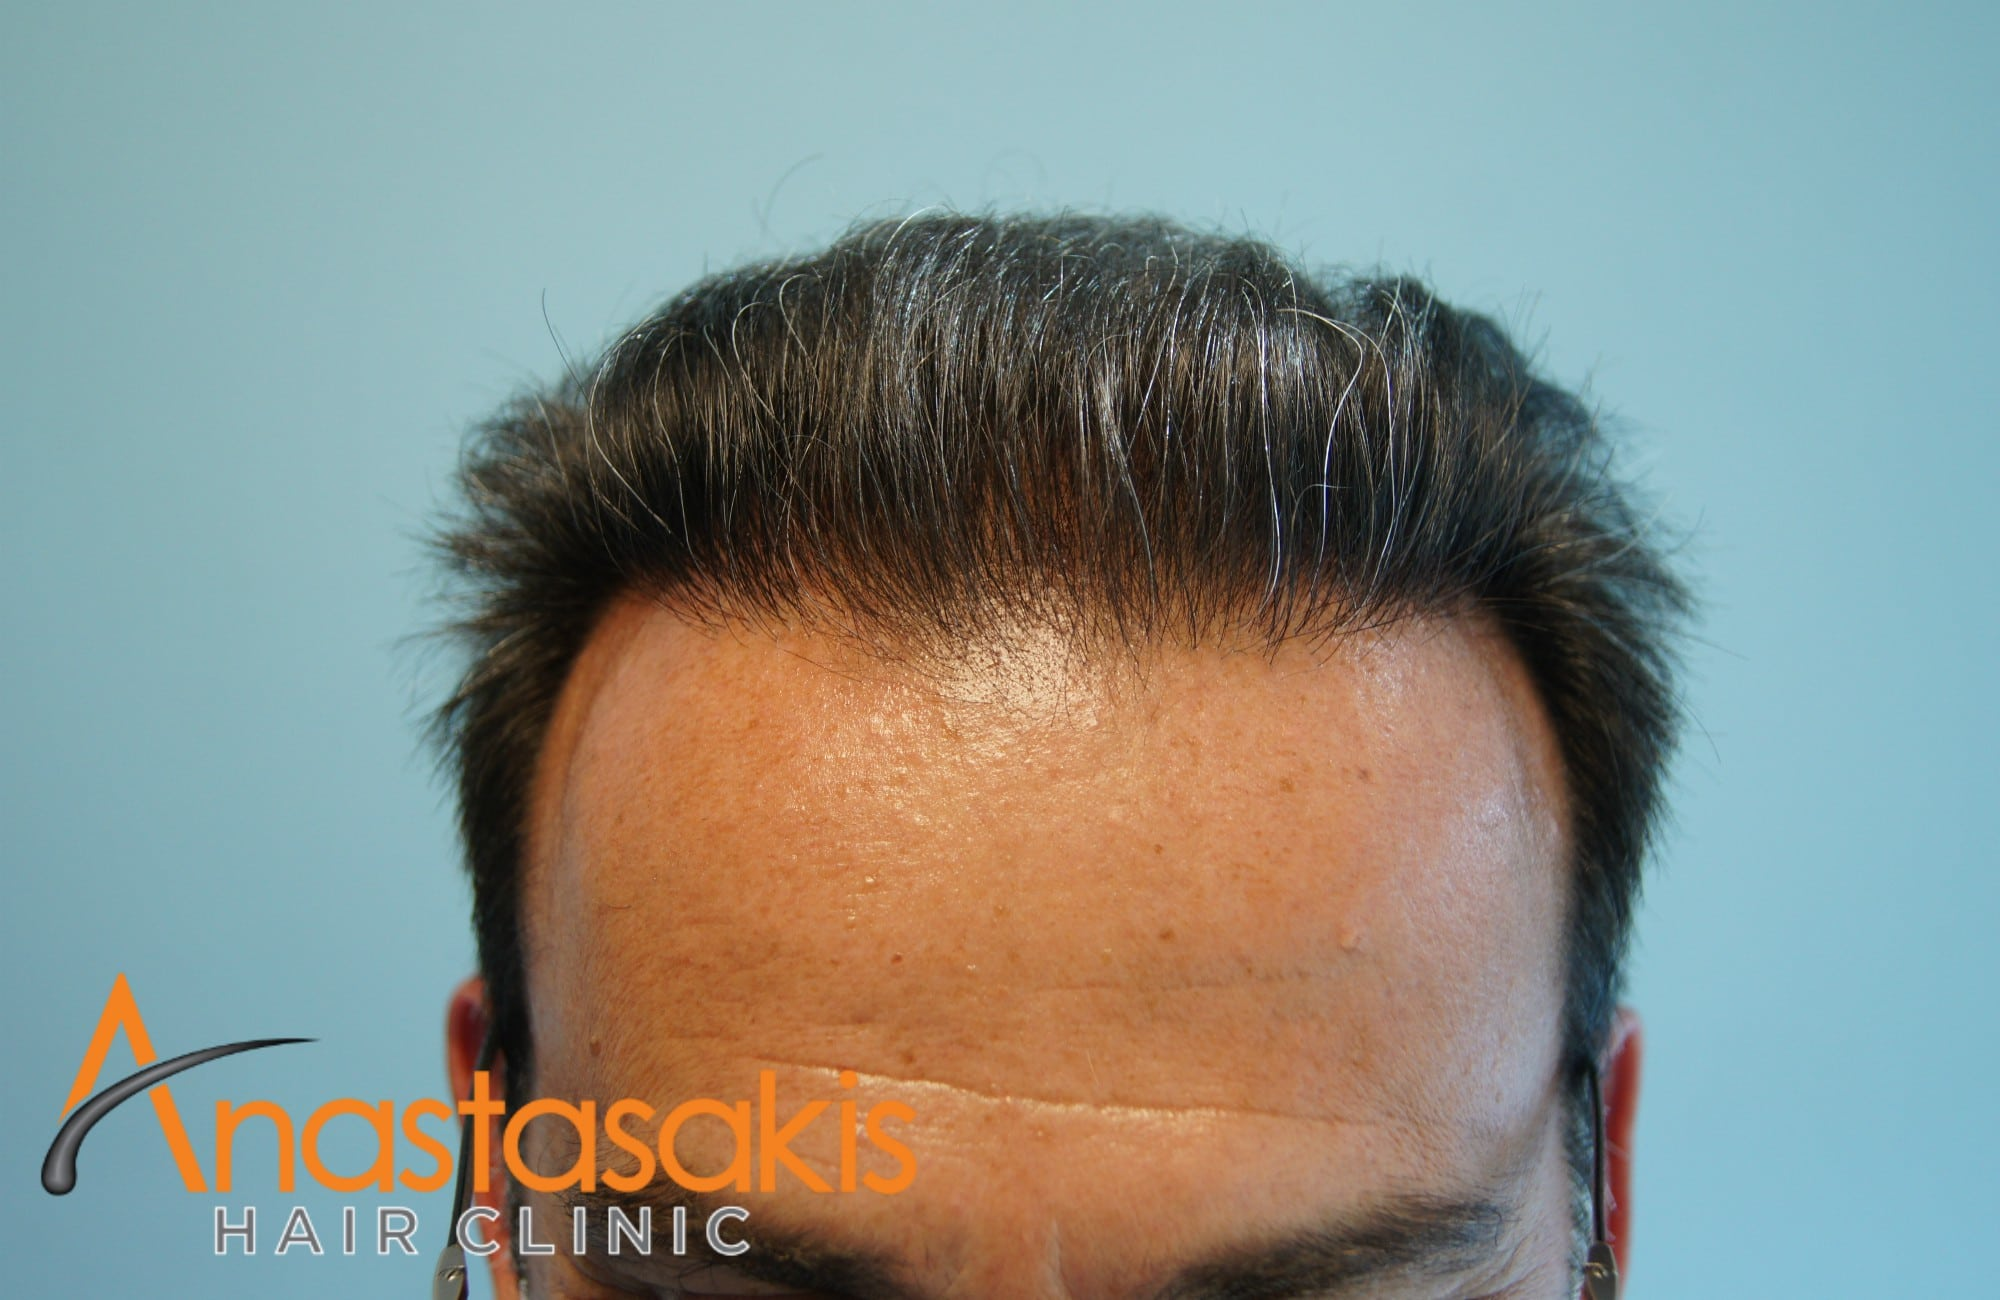 hairline ασθενούς μετά τη μεταμοσχευση μαλλιων με 3500 fus με τη μεθοδο fut